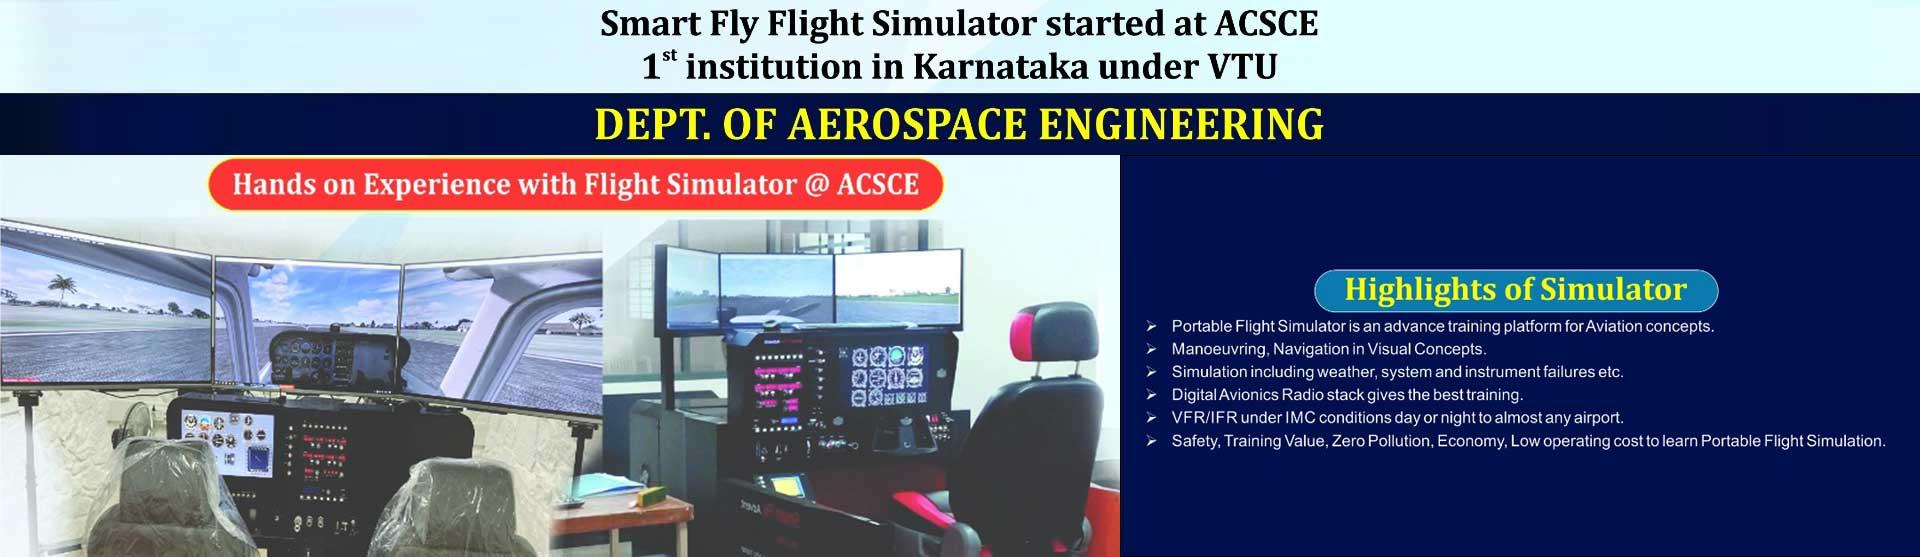 Smart Fly Flight Simulator started in ACSCE Banner